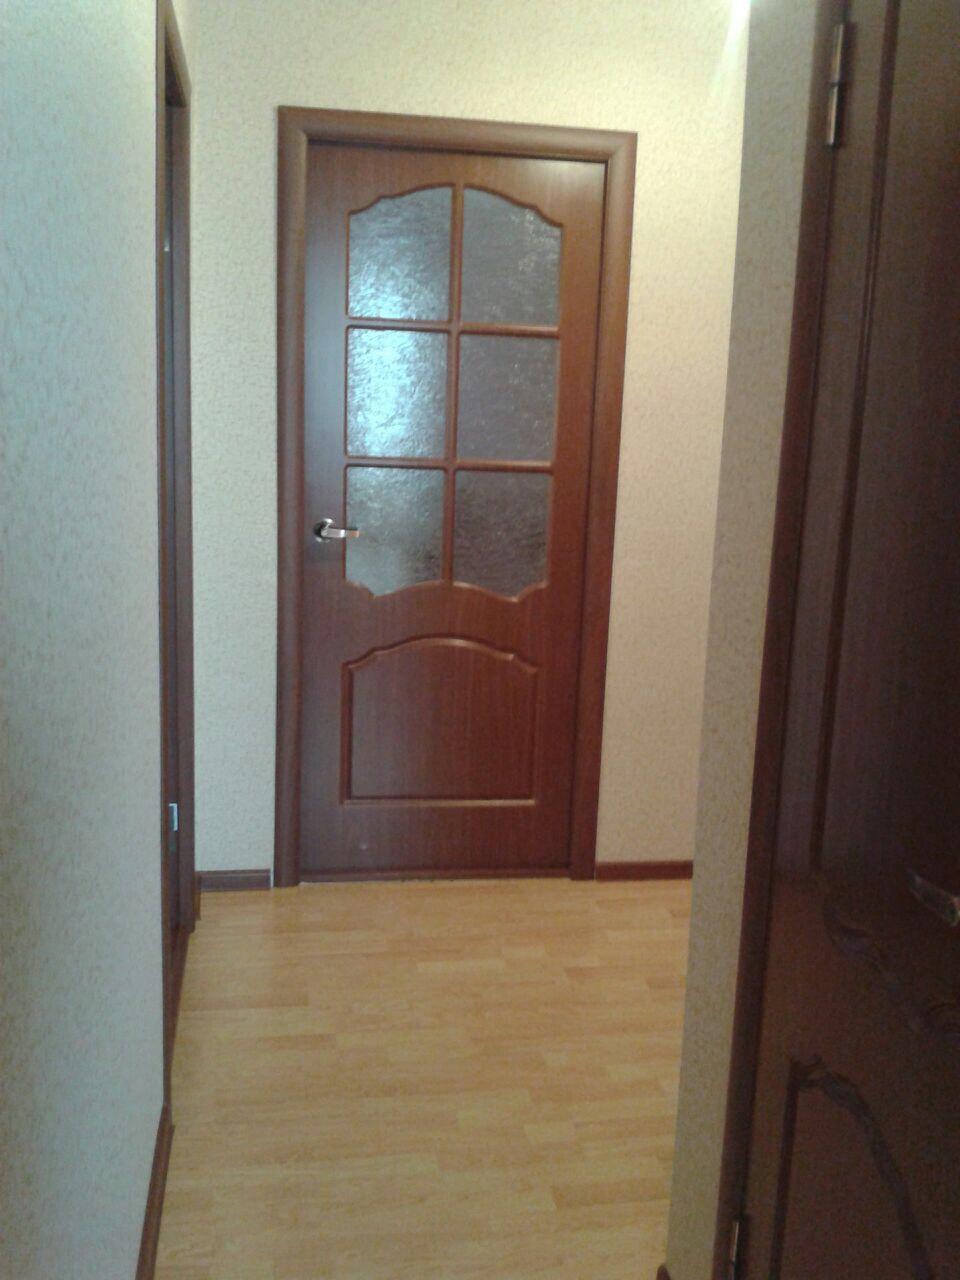 Квартира 3 комнатная в Майкоп район Черемушки СШ № 22